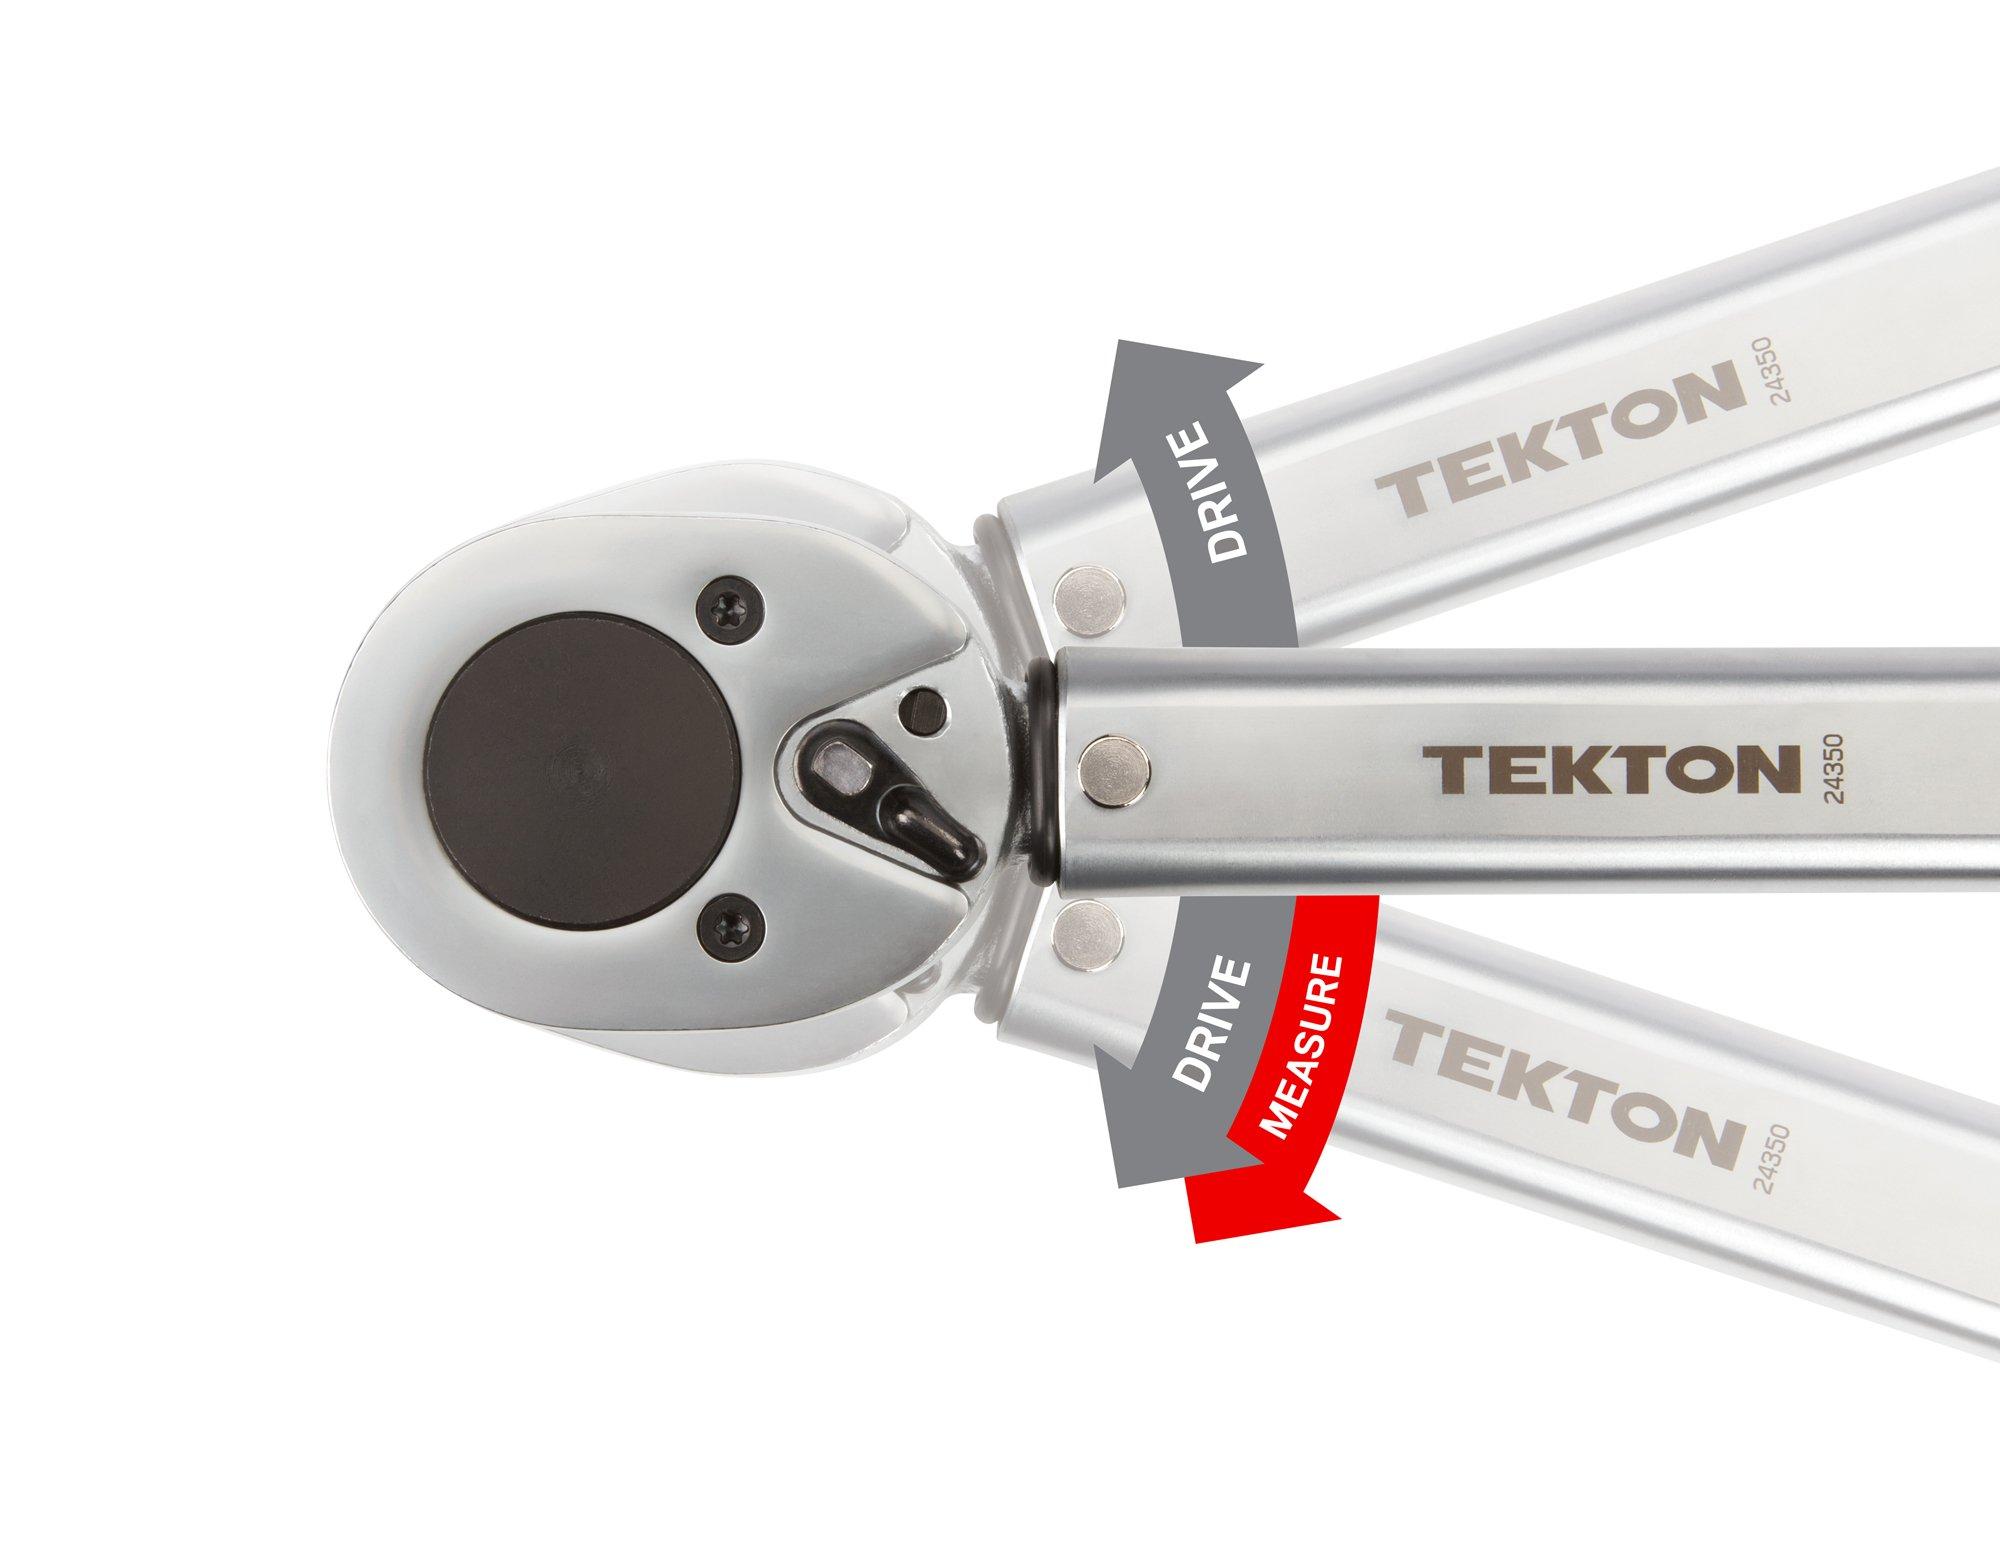 TEKTON 24350 3/4-Inch Drive Click Torque Wrench (50-300 ft.-lb./67.8-406.7 Nm) by TEKTON (Image #6)